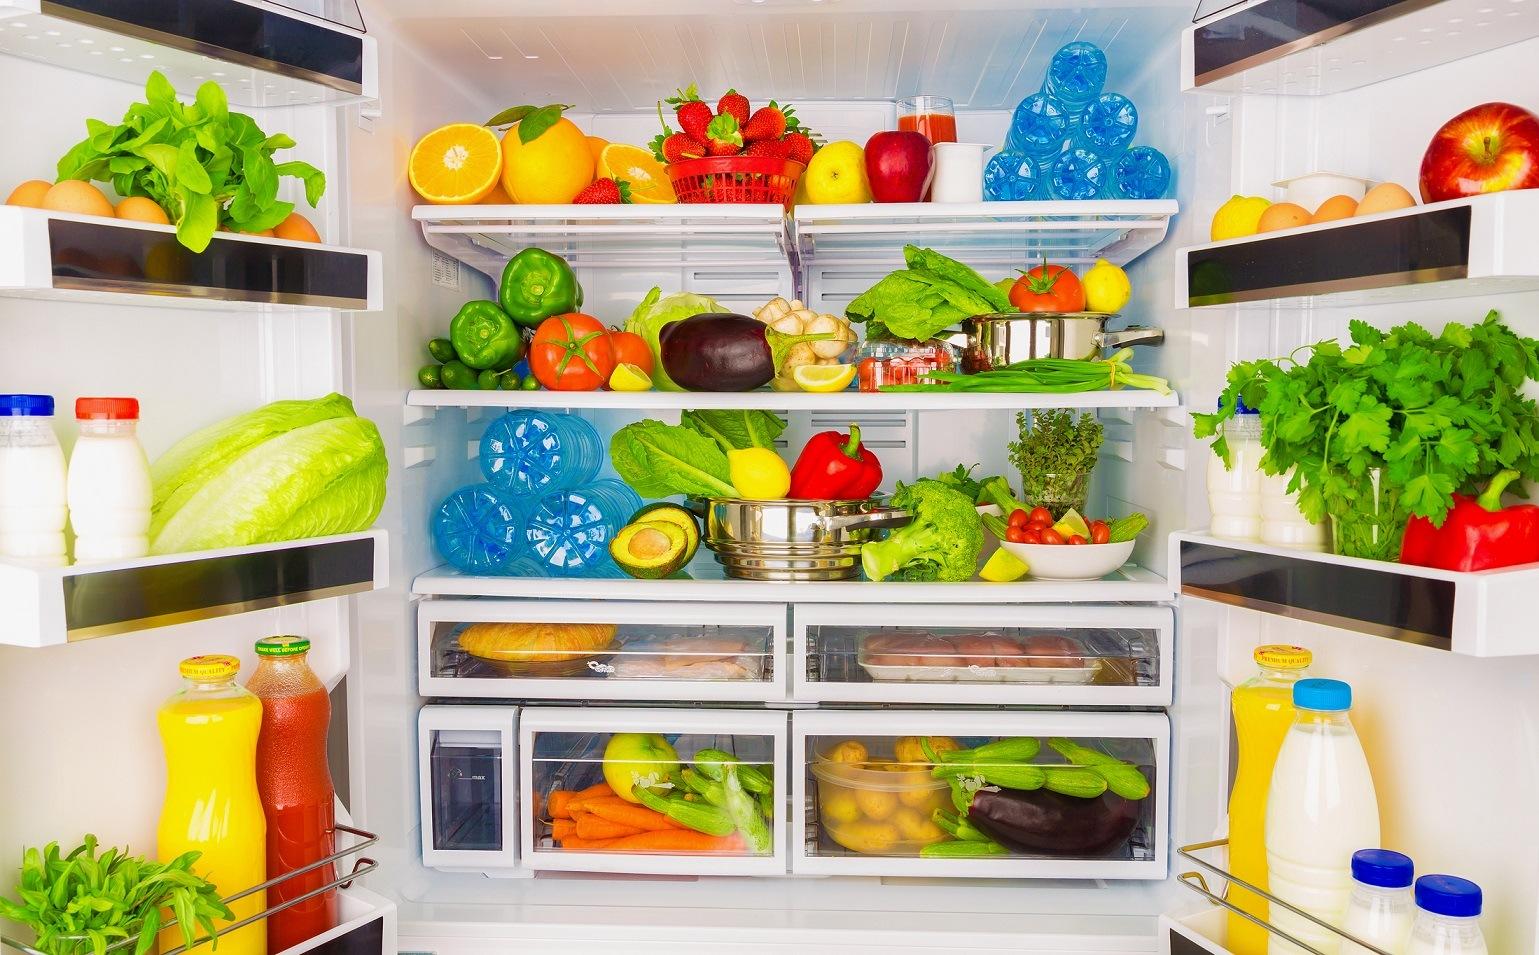 Full fridge with fruit and veggies